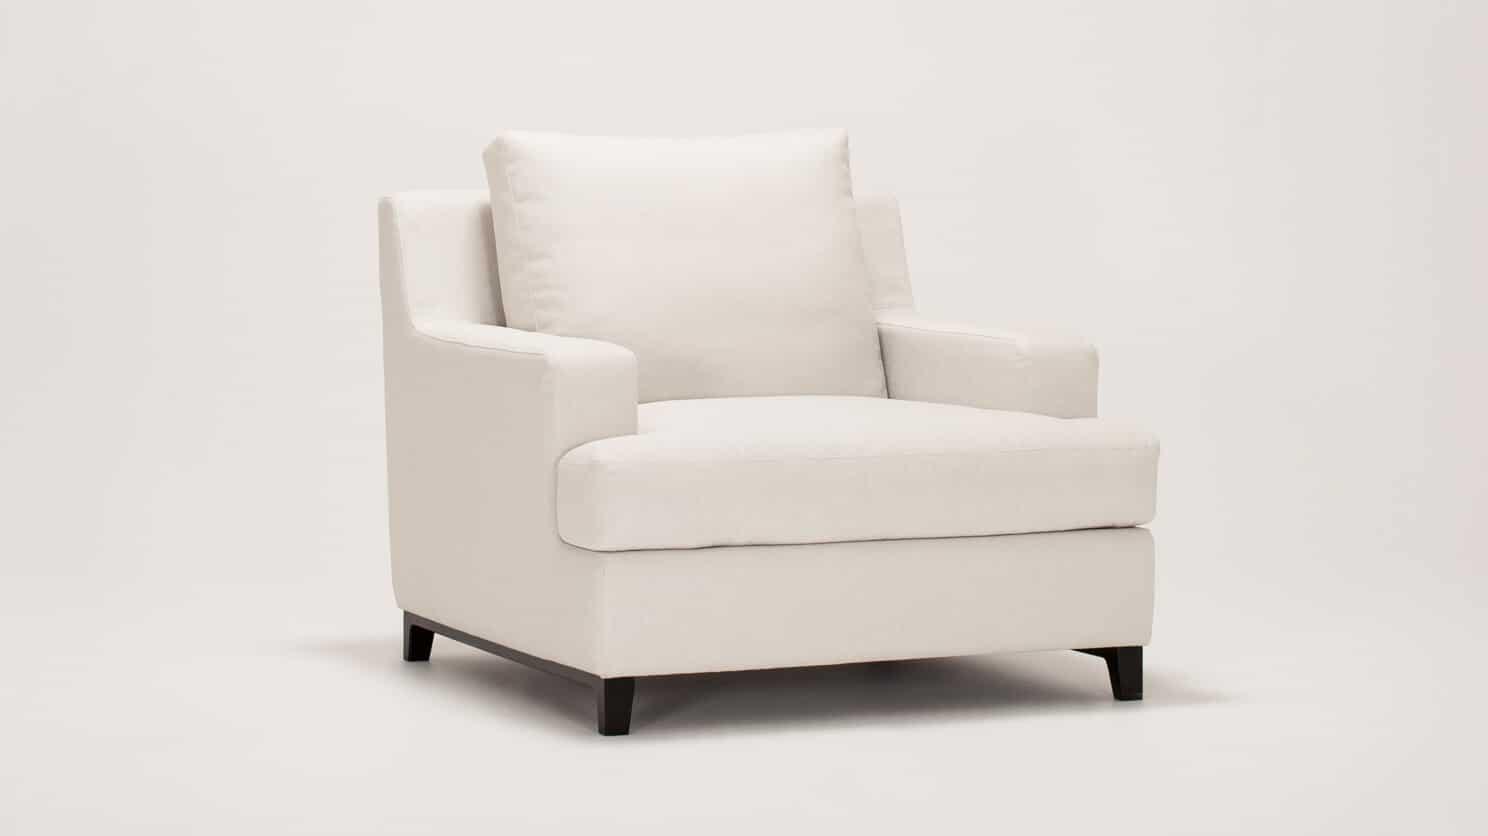 30113 02 2 chairs blanche chair polo cream corner